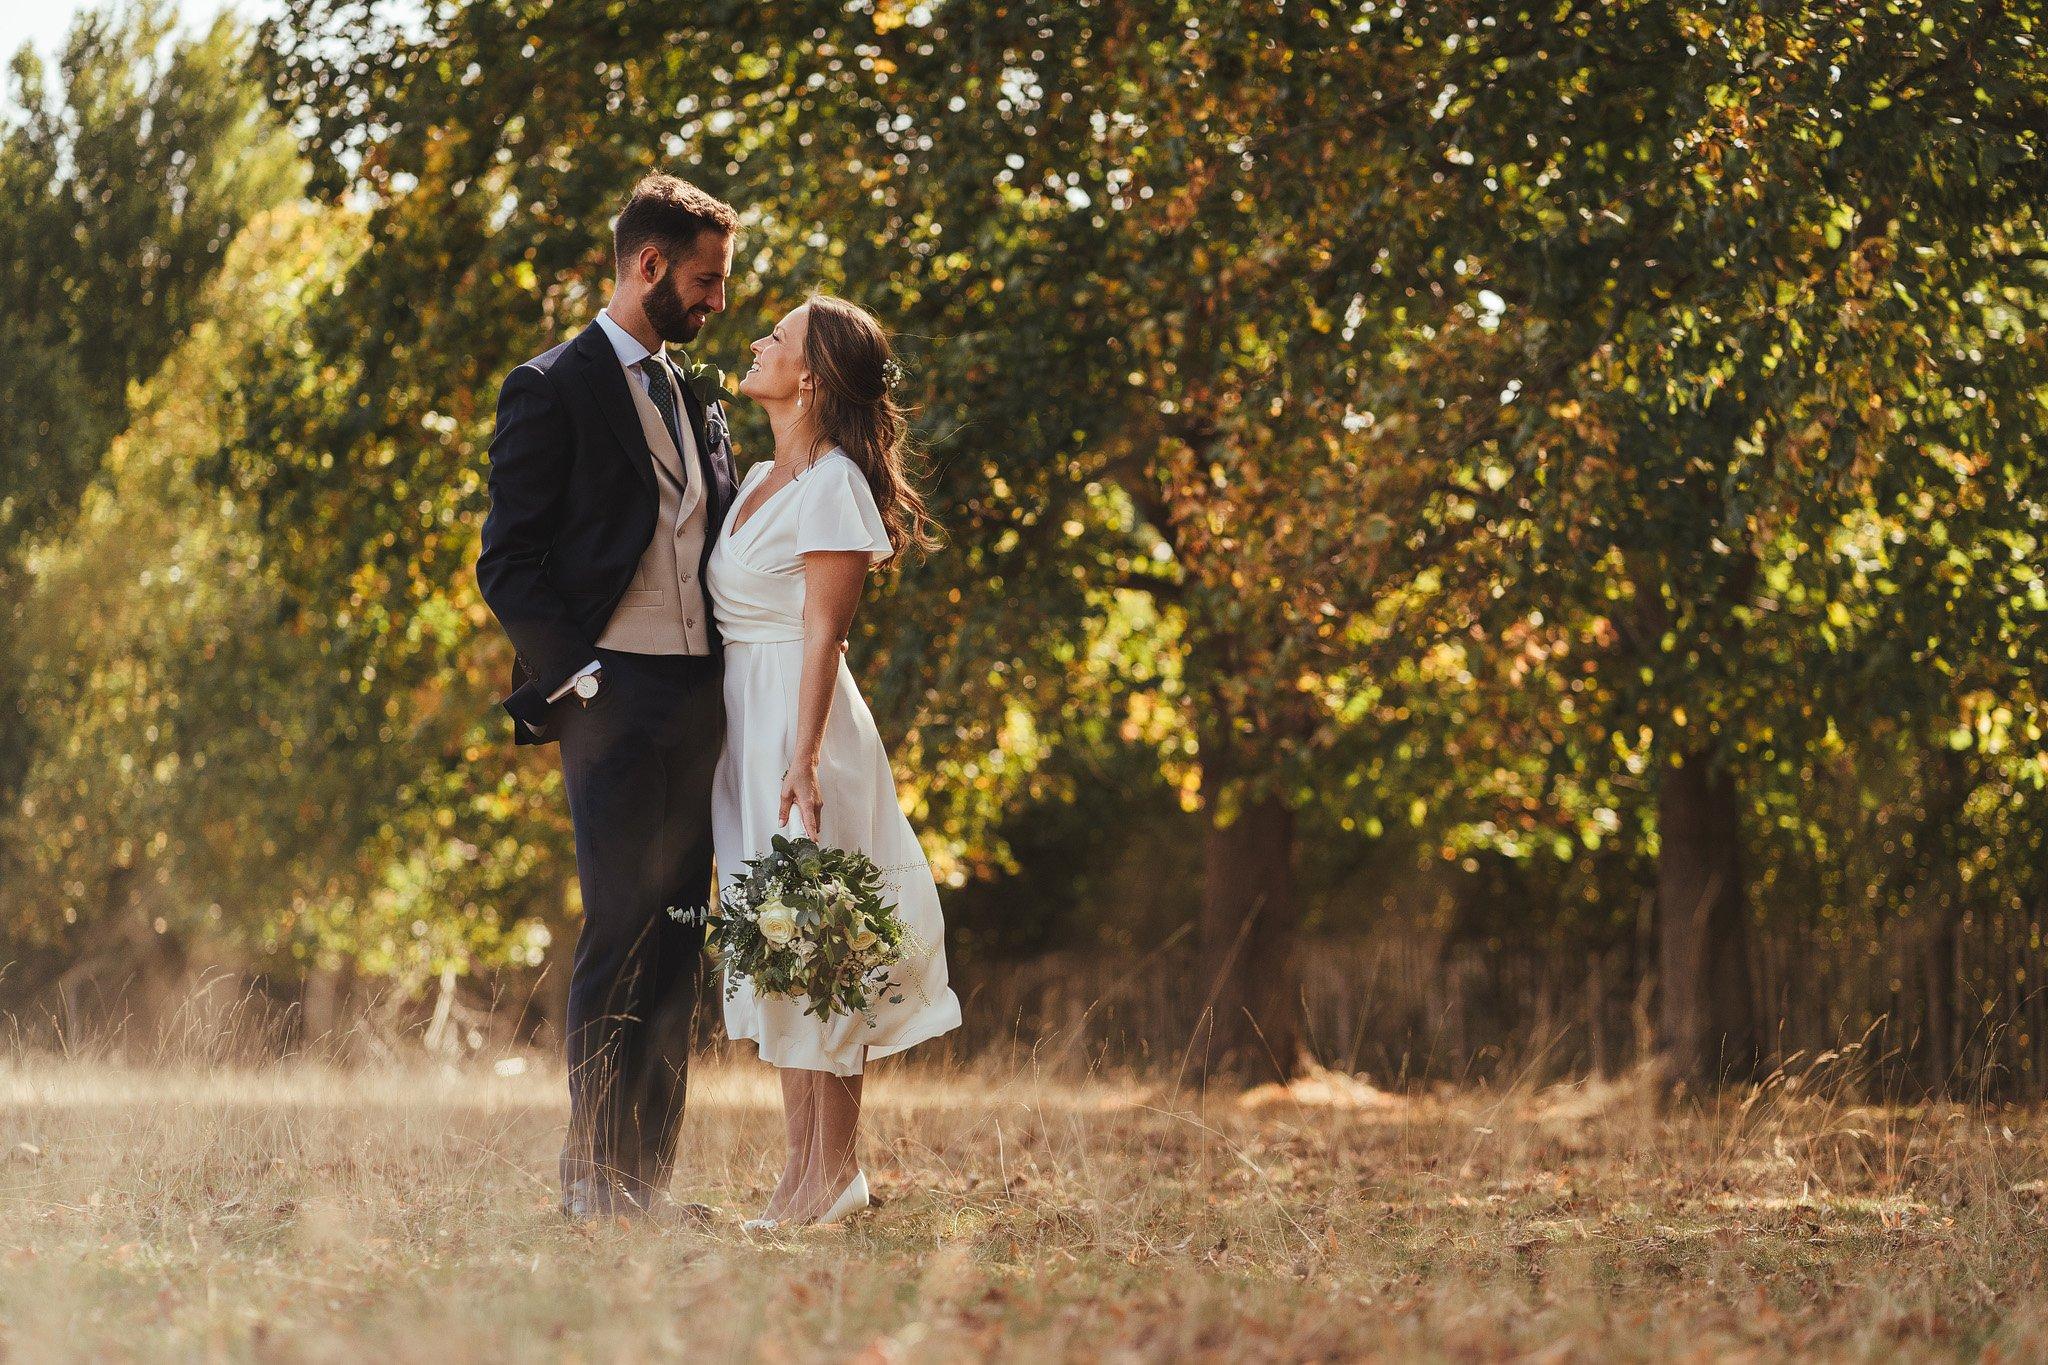 Wedding Photographer Of The Year 2020022